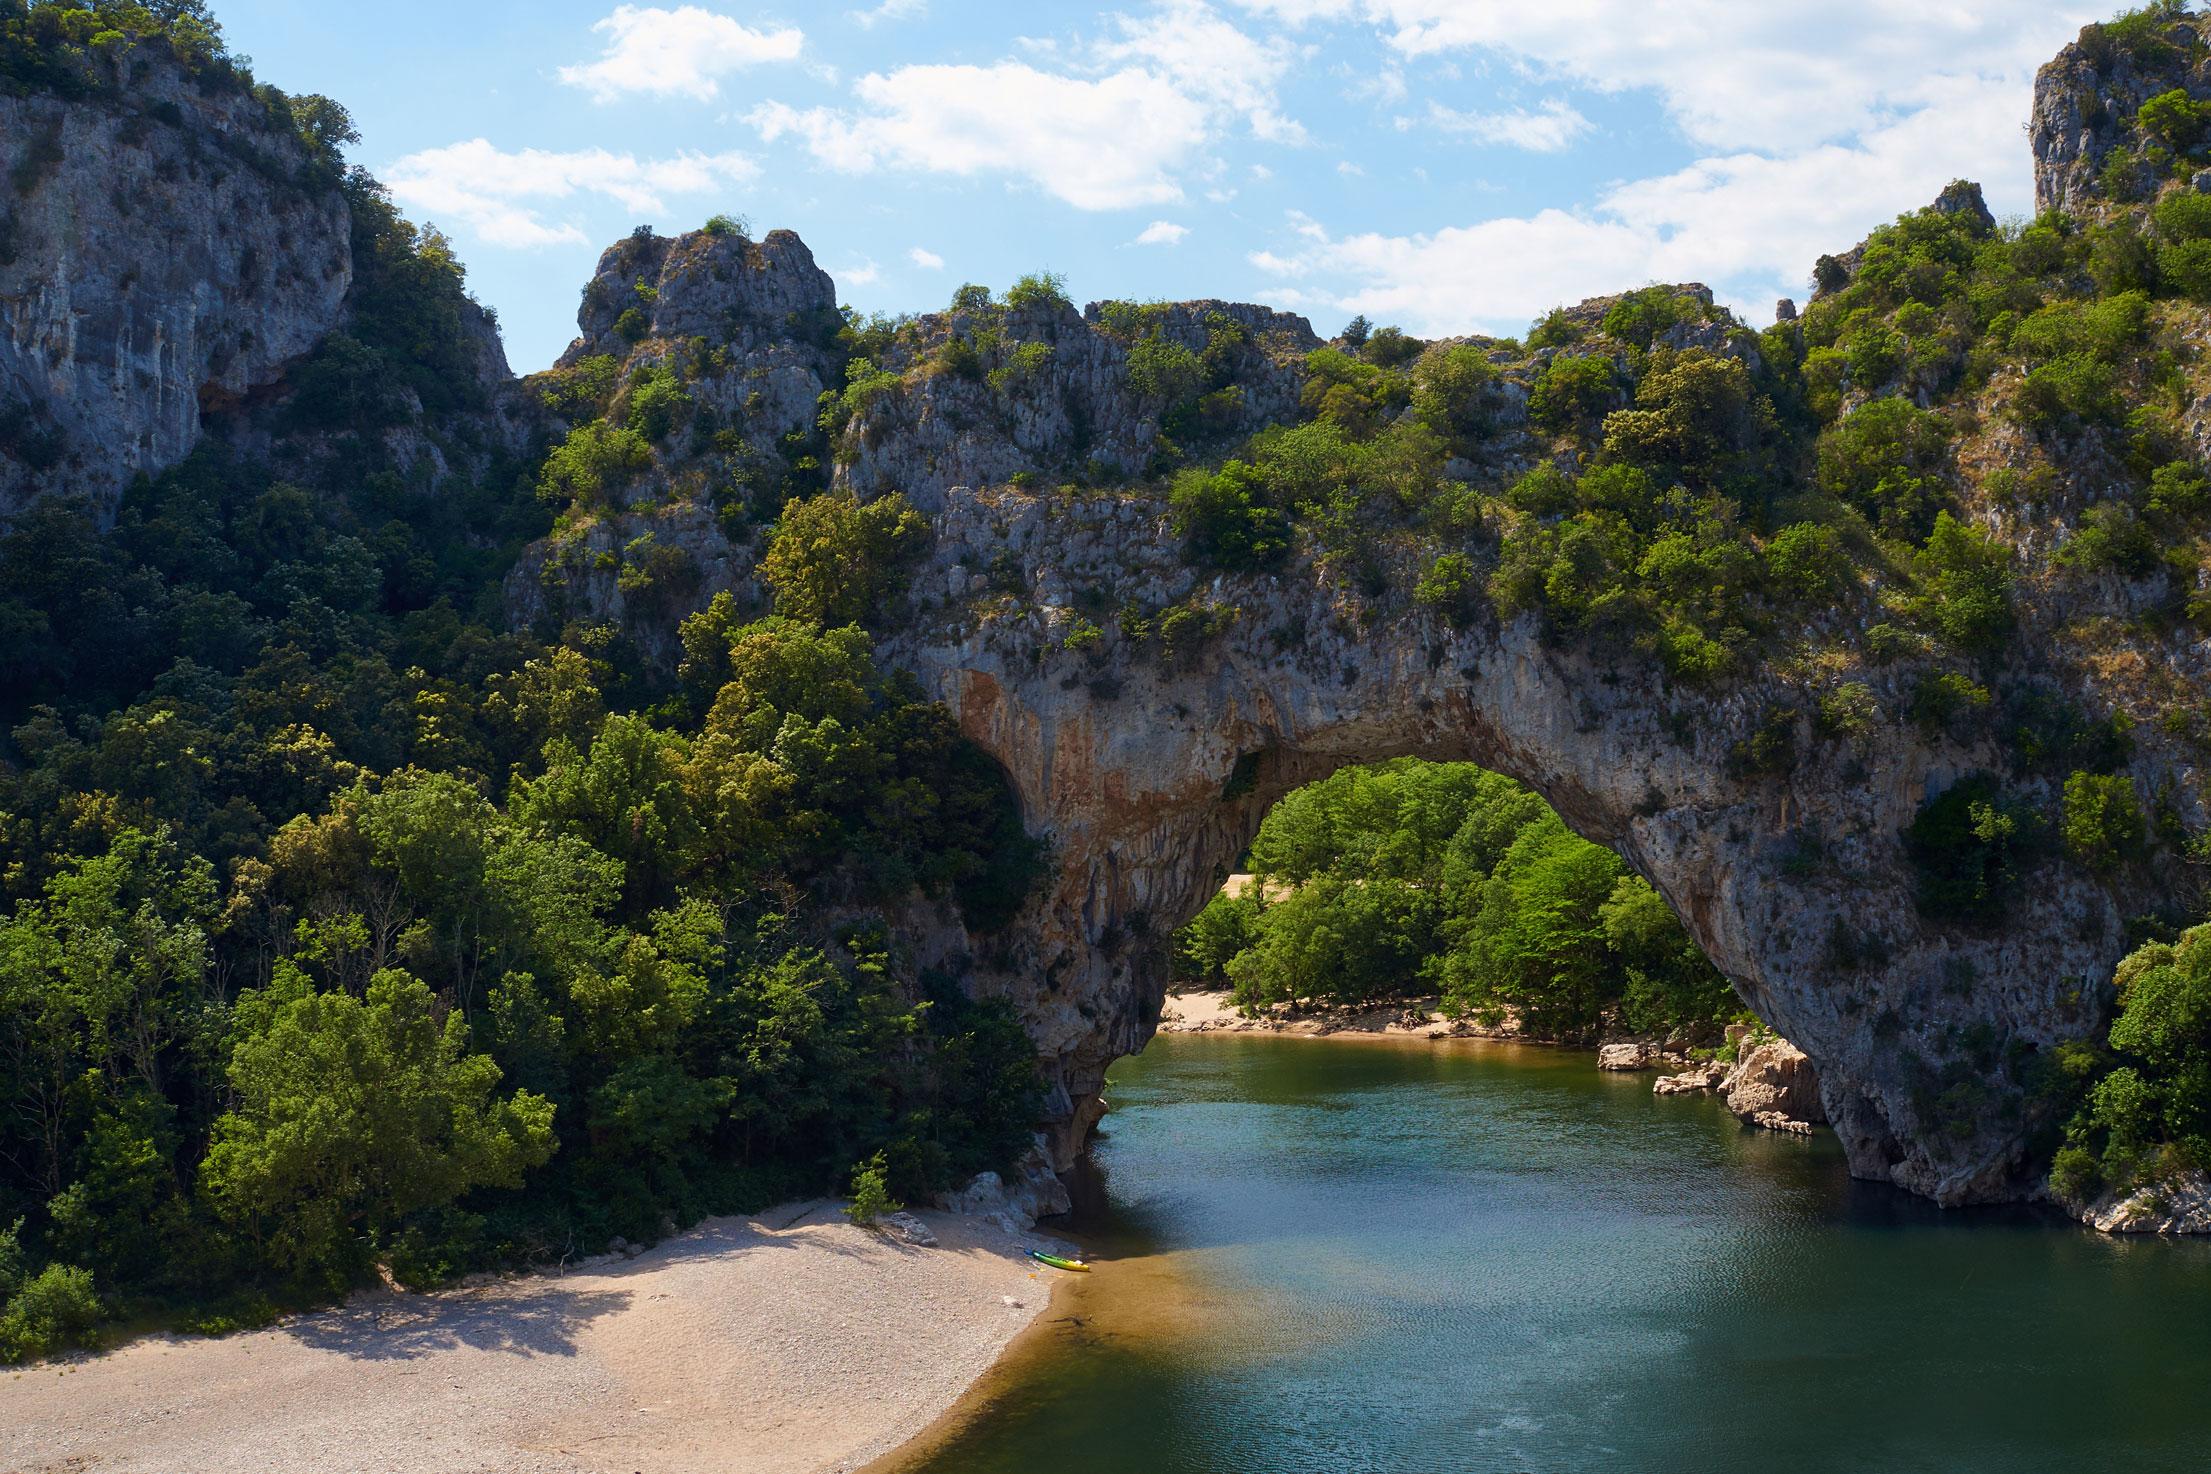 The Ardèche in the Rhône-Alps, France